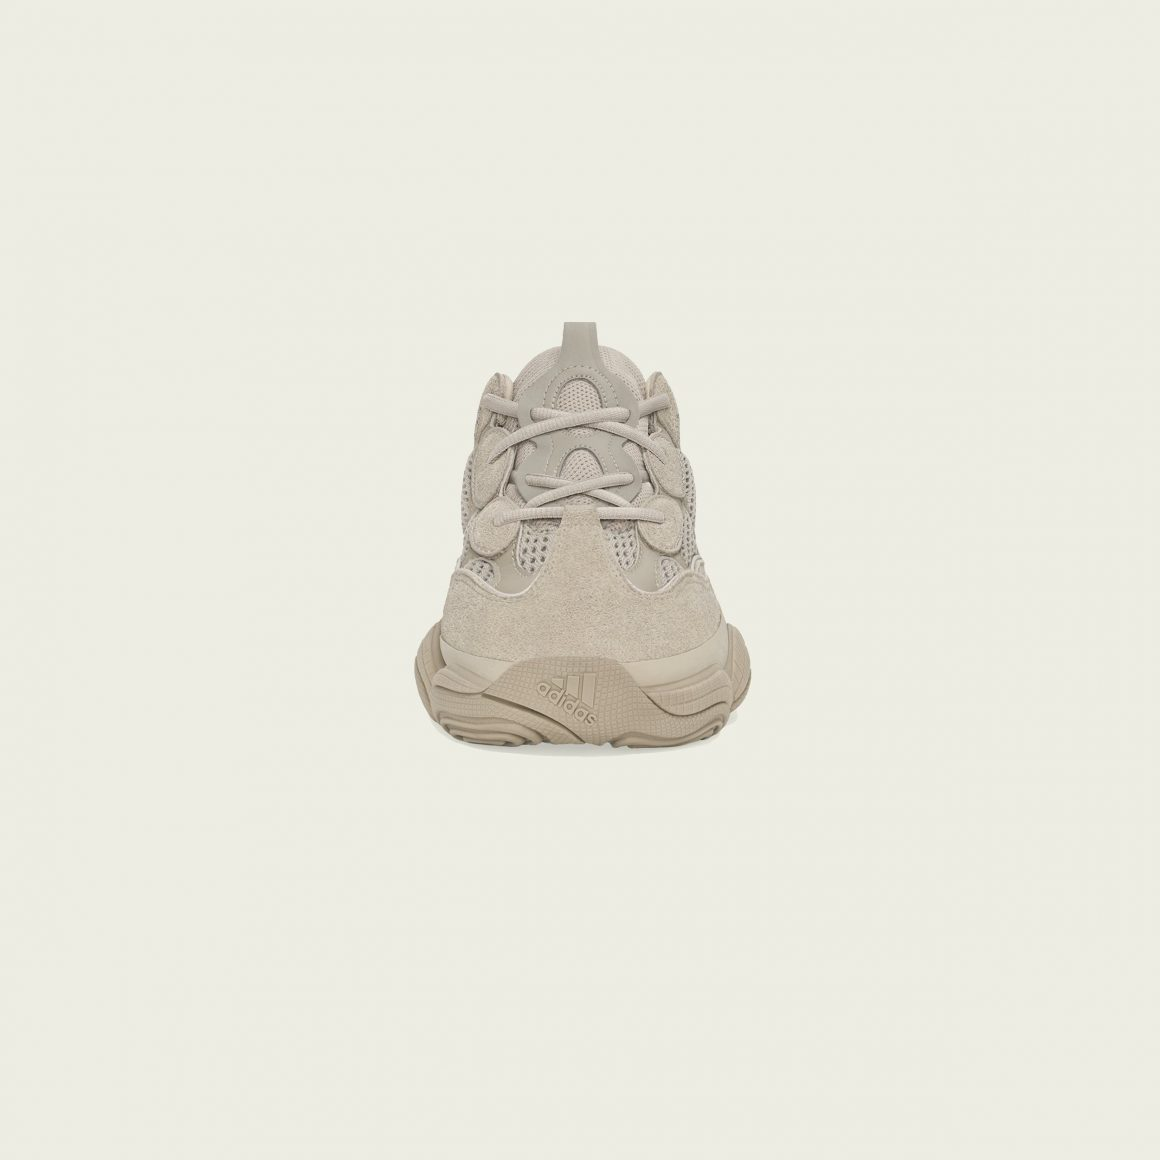 adidas Yeezy 500 ''Taupe Light'' – GX3605